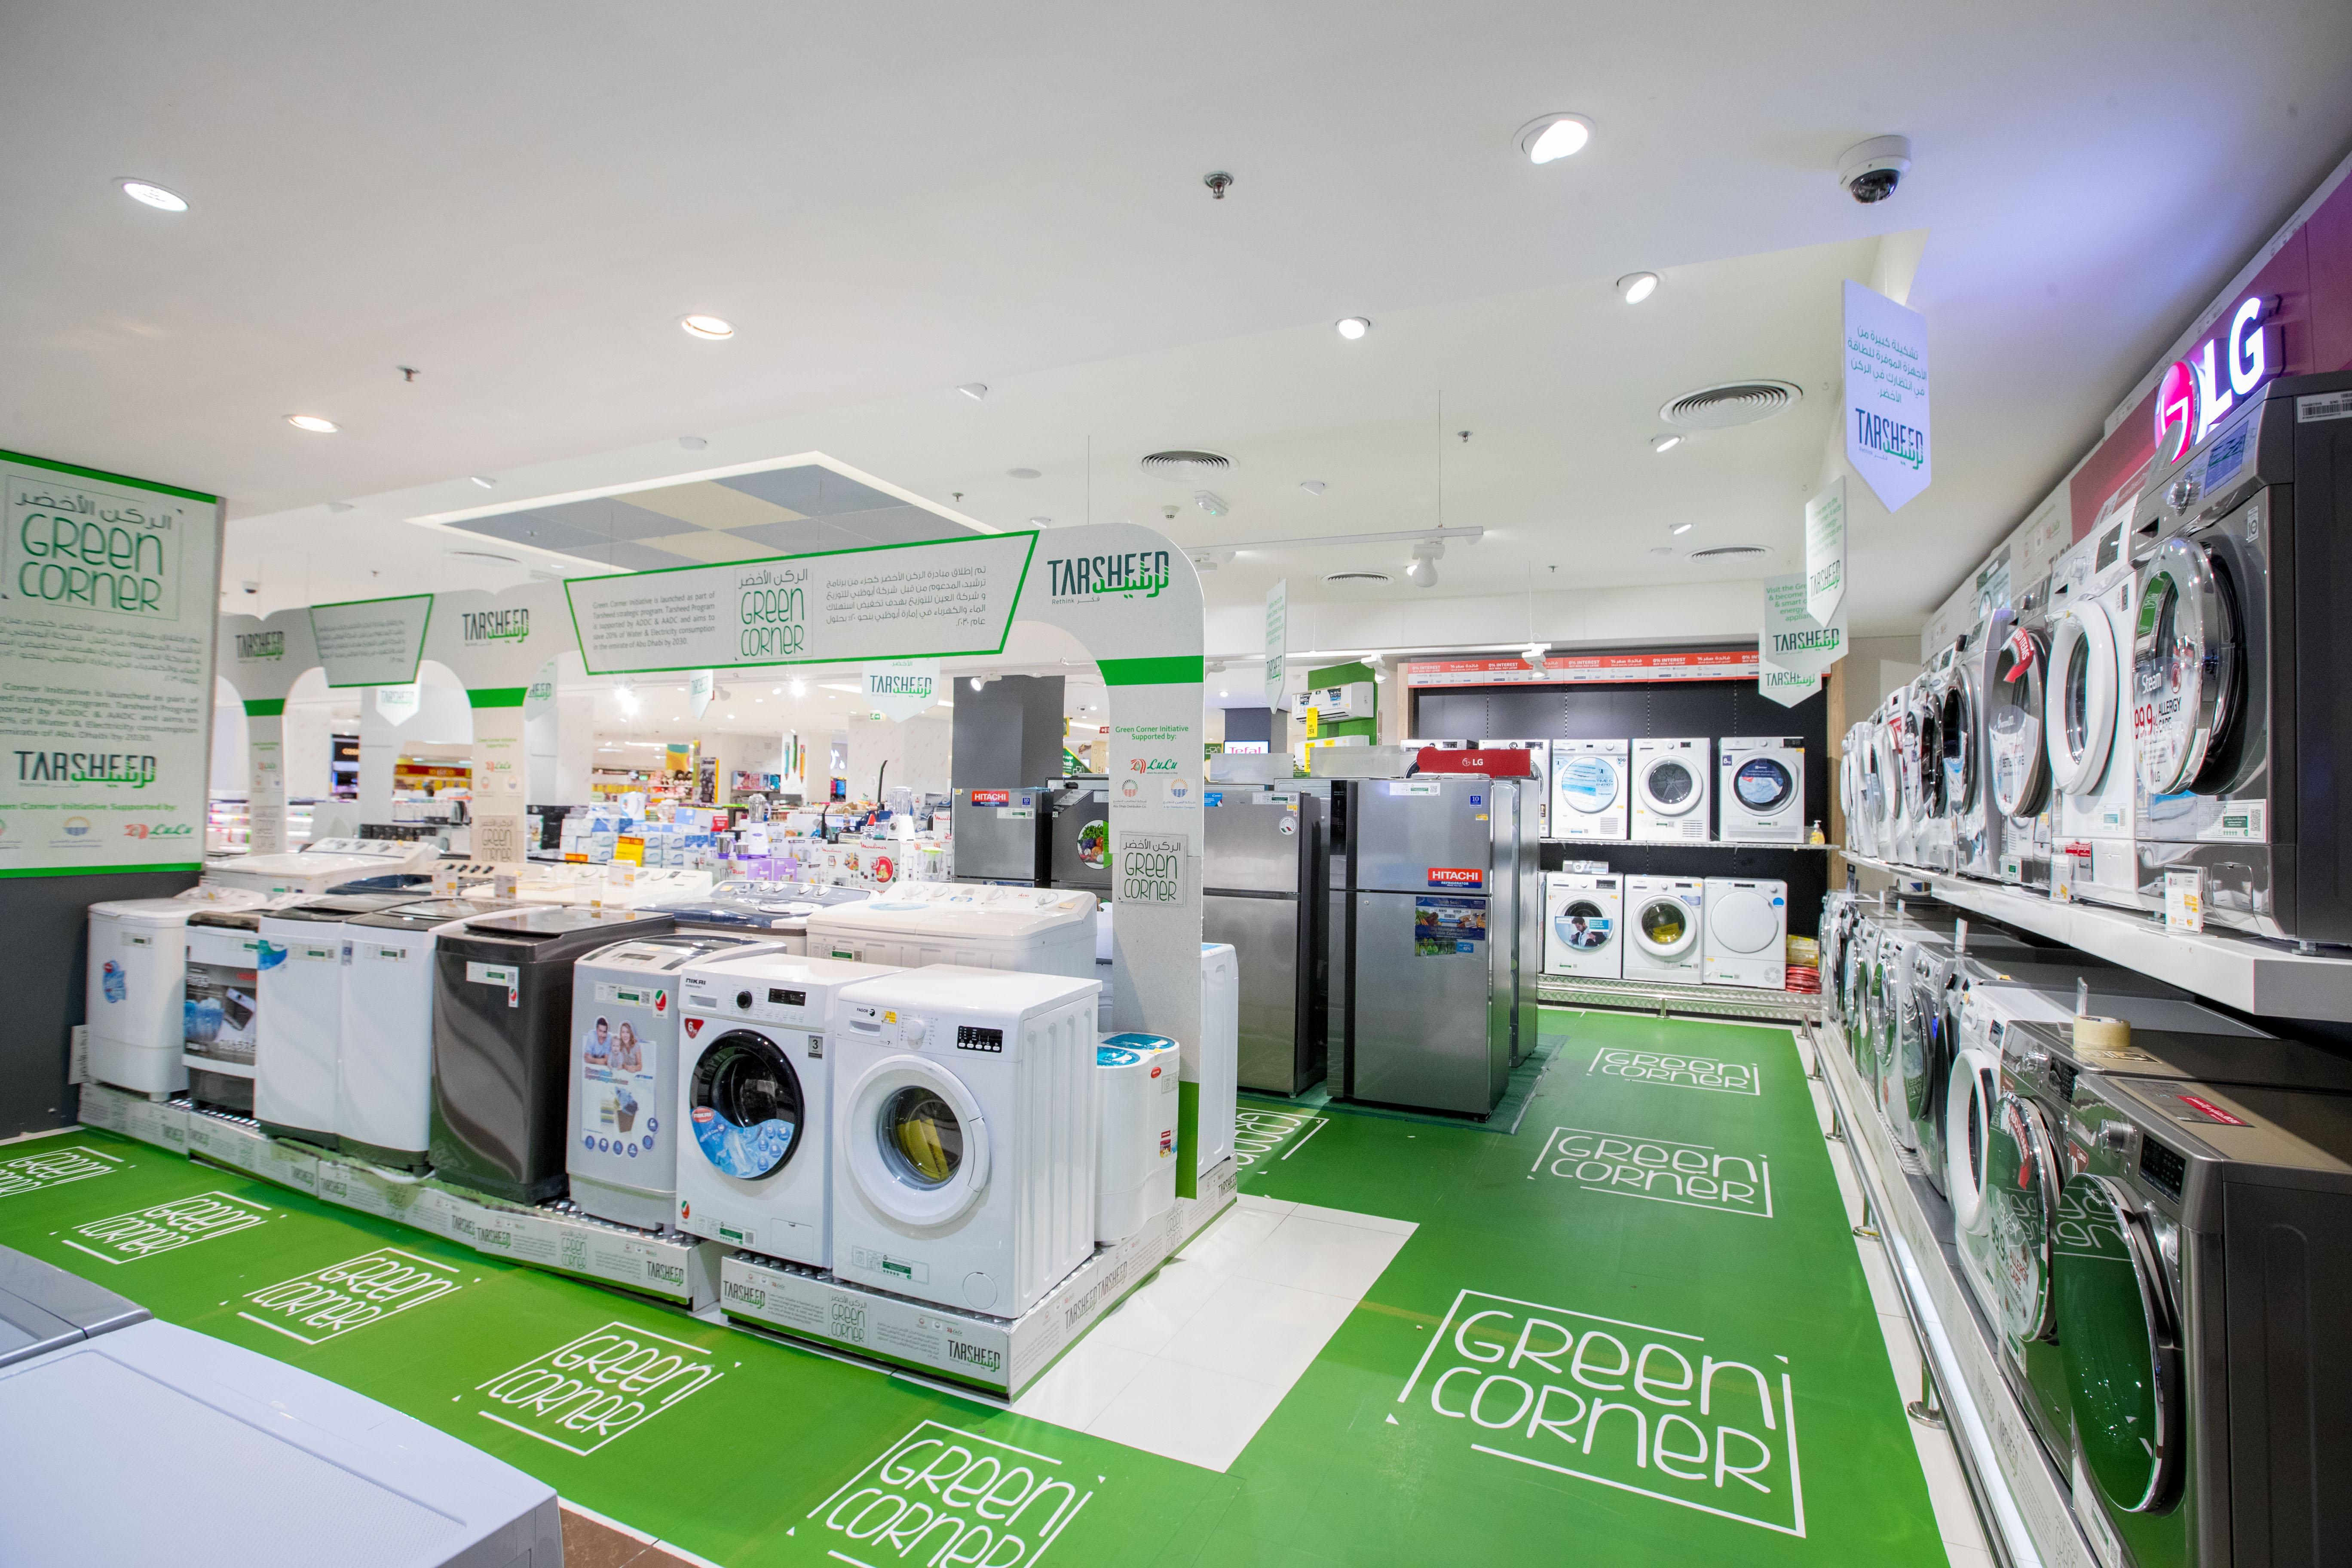 Abu Dhabi Distribution Company expands Green Corner